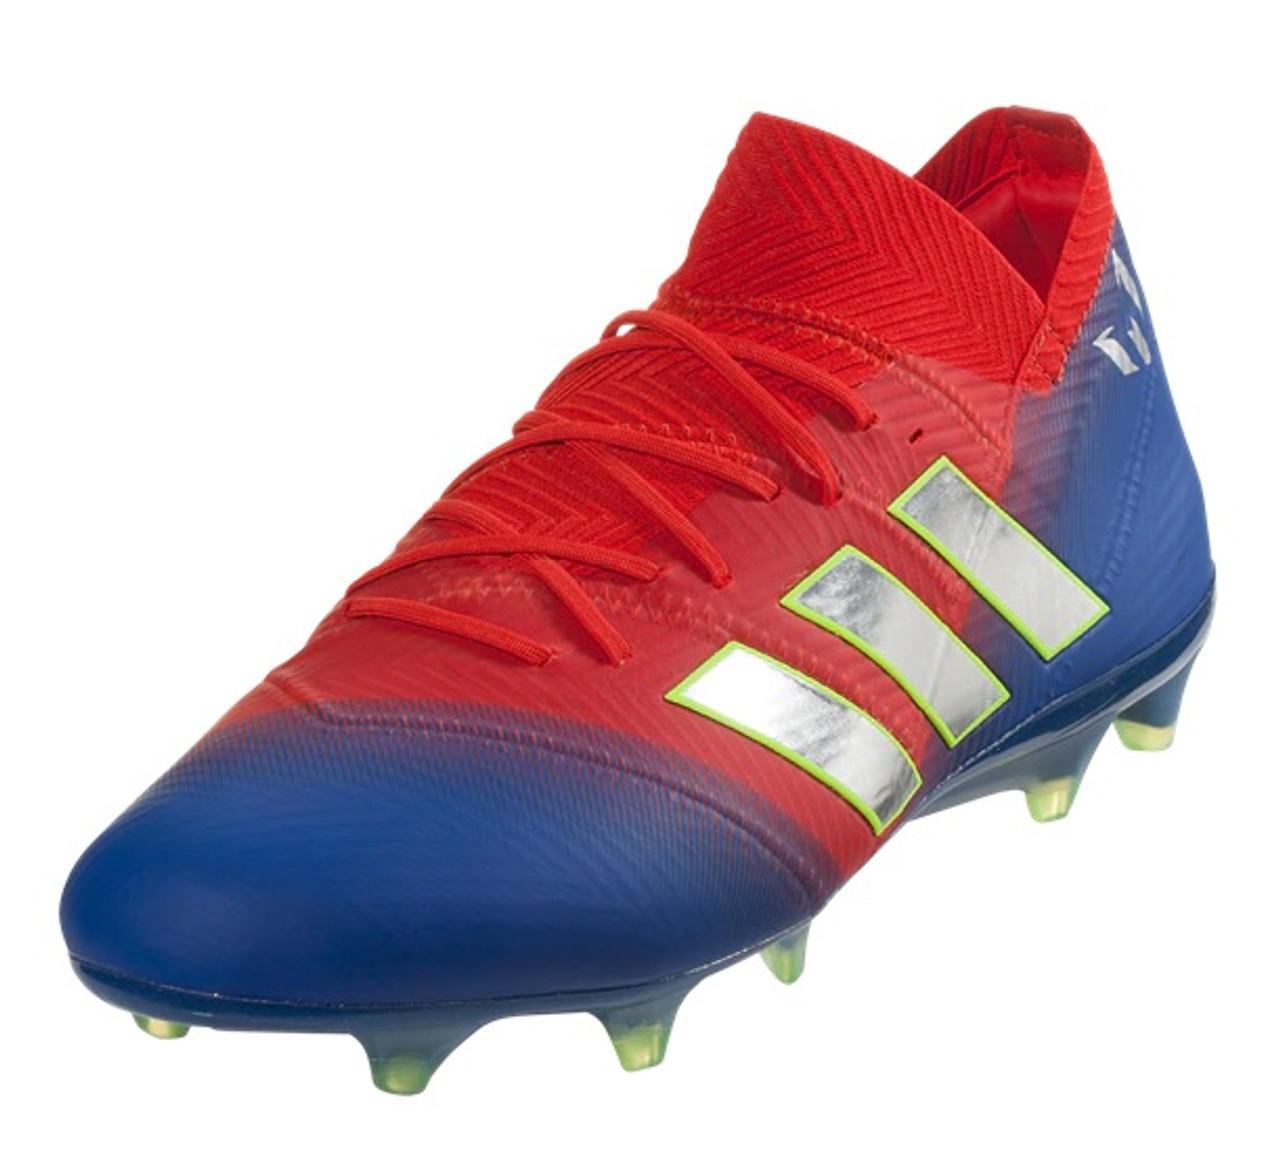 205a1f705f00 Adidas Nemeziz Messi 18.1 FG - Active Red/Silver Metallic/Football ...